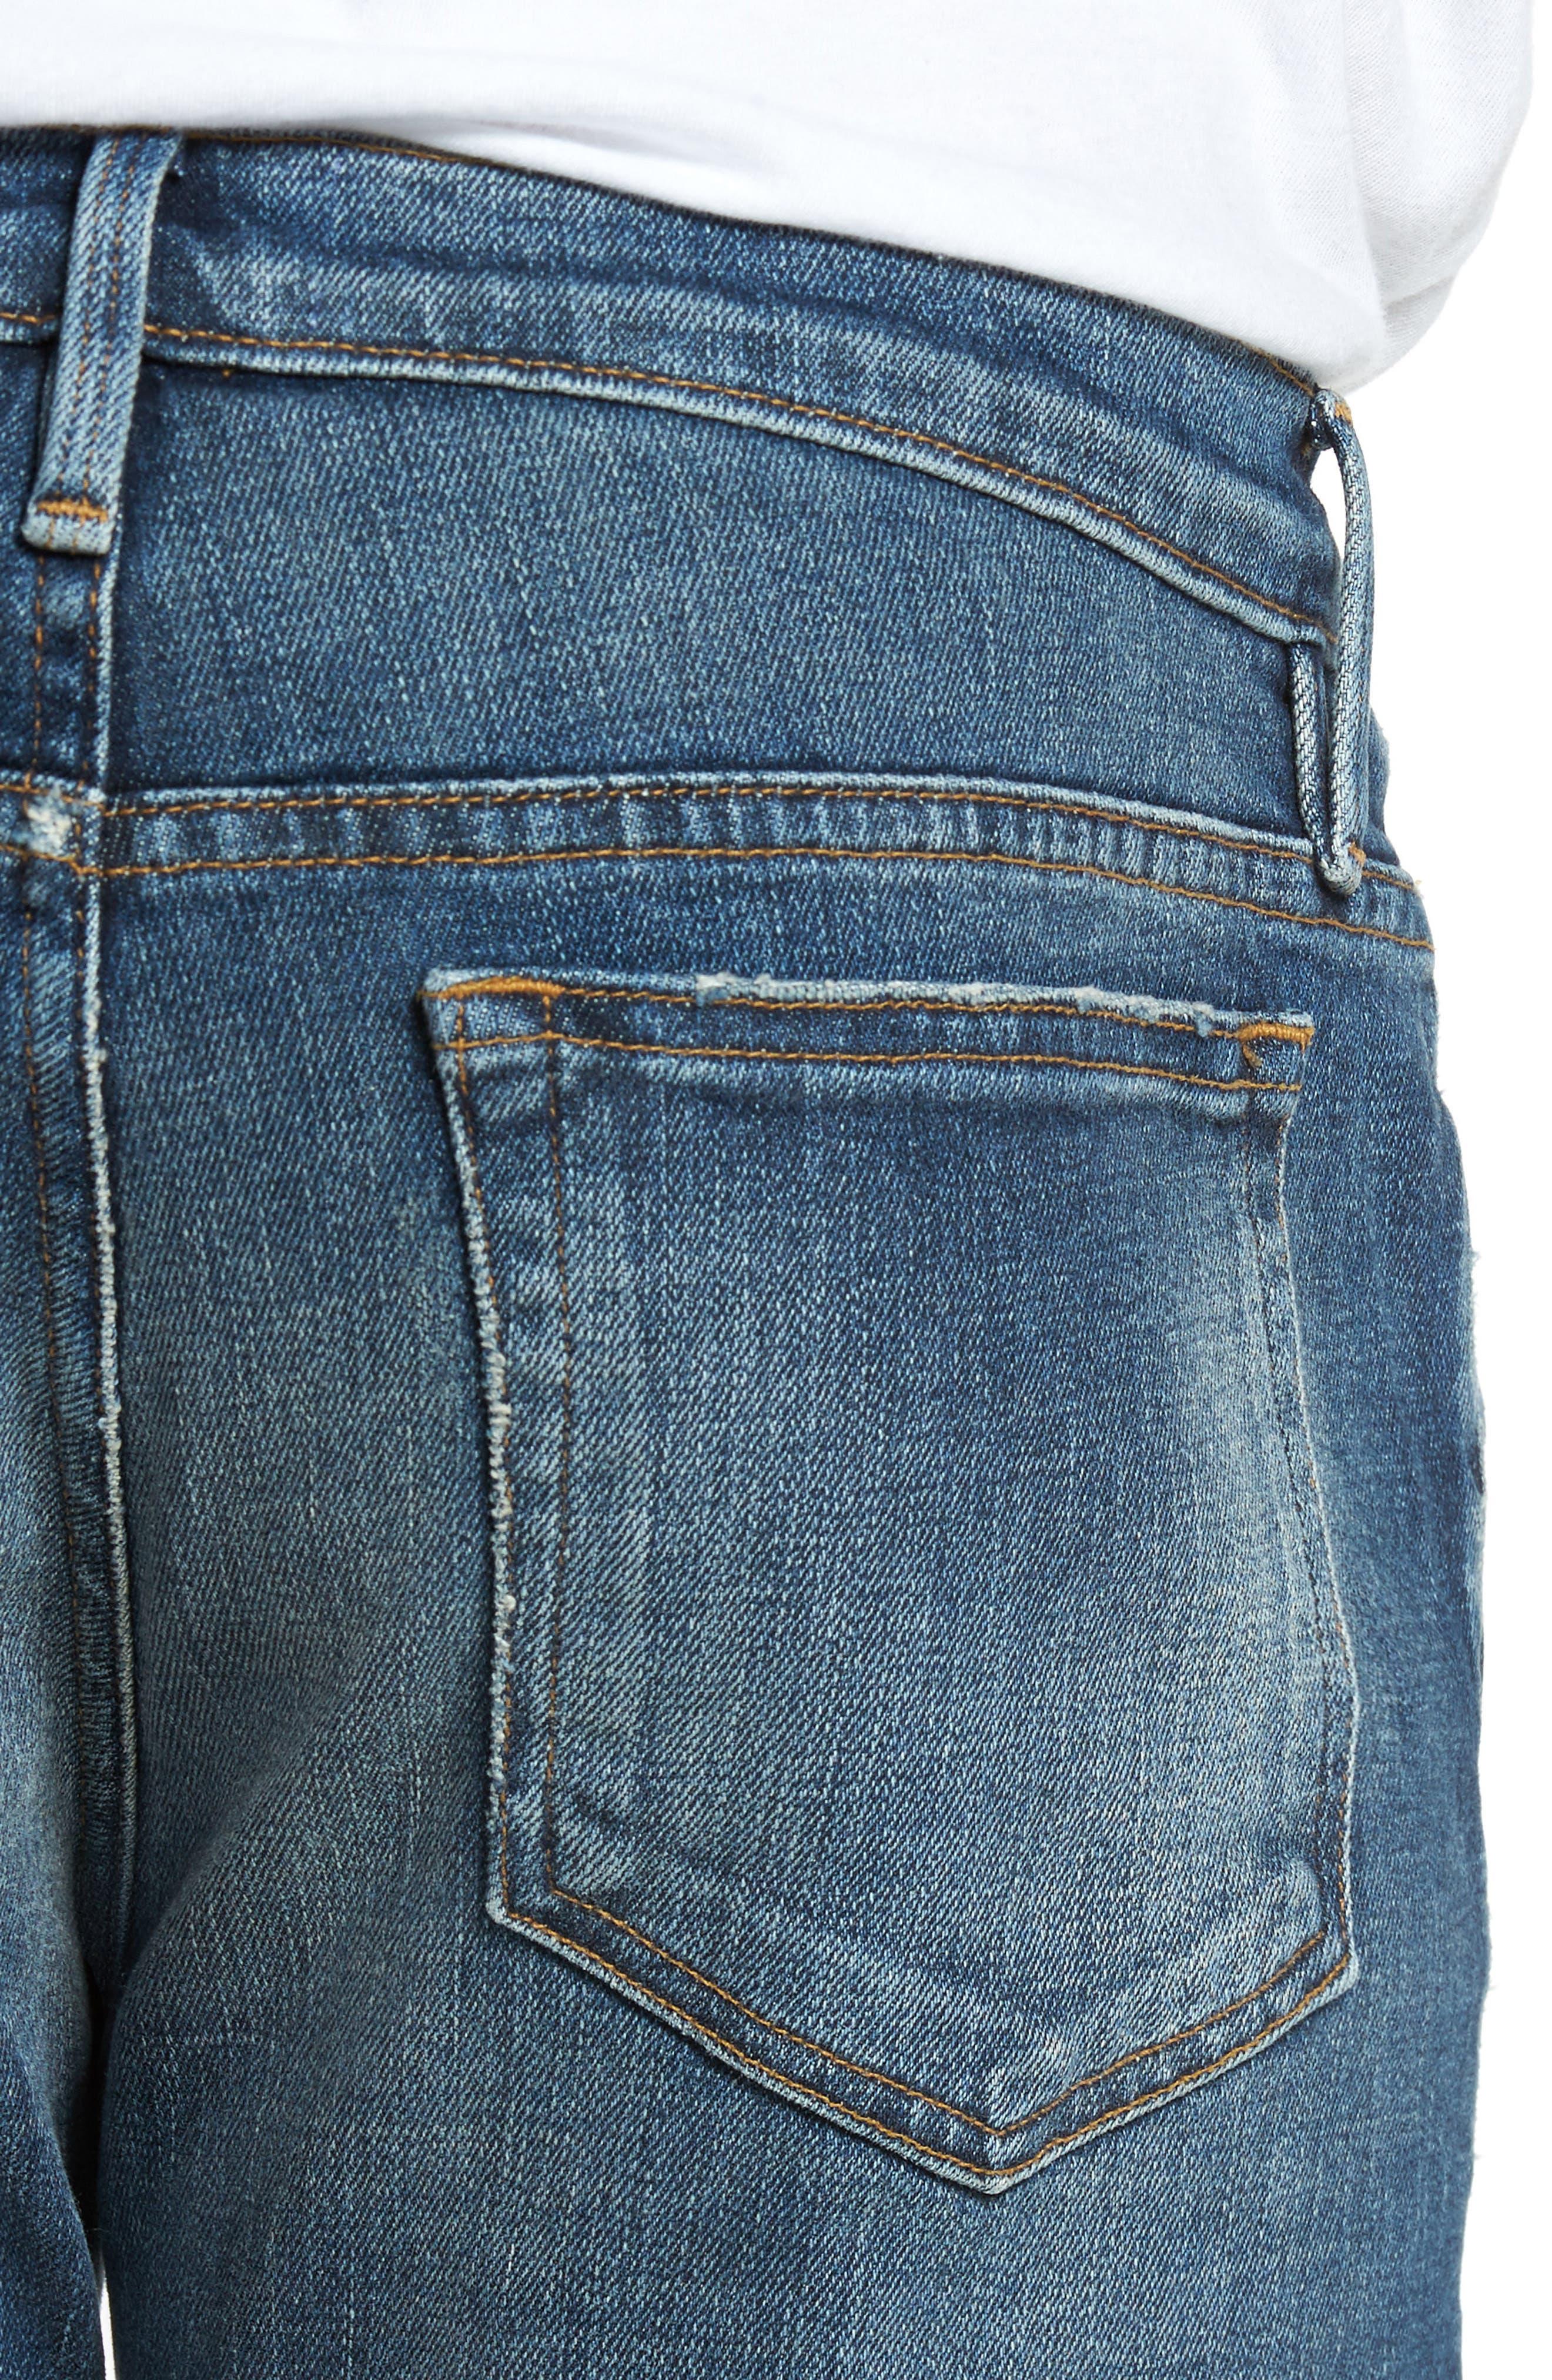 L'Homme Slim Fit Jeans,                             Alternate thumbnail 4, color,                             Salt Lake